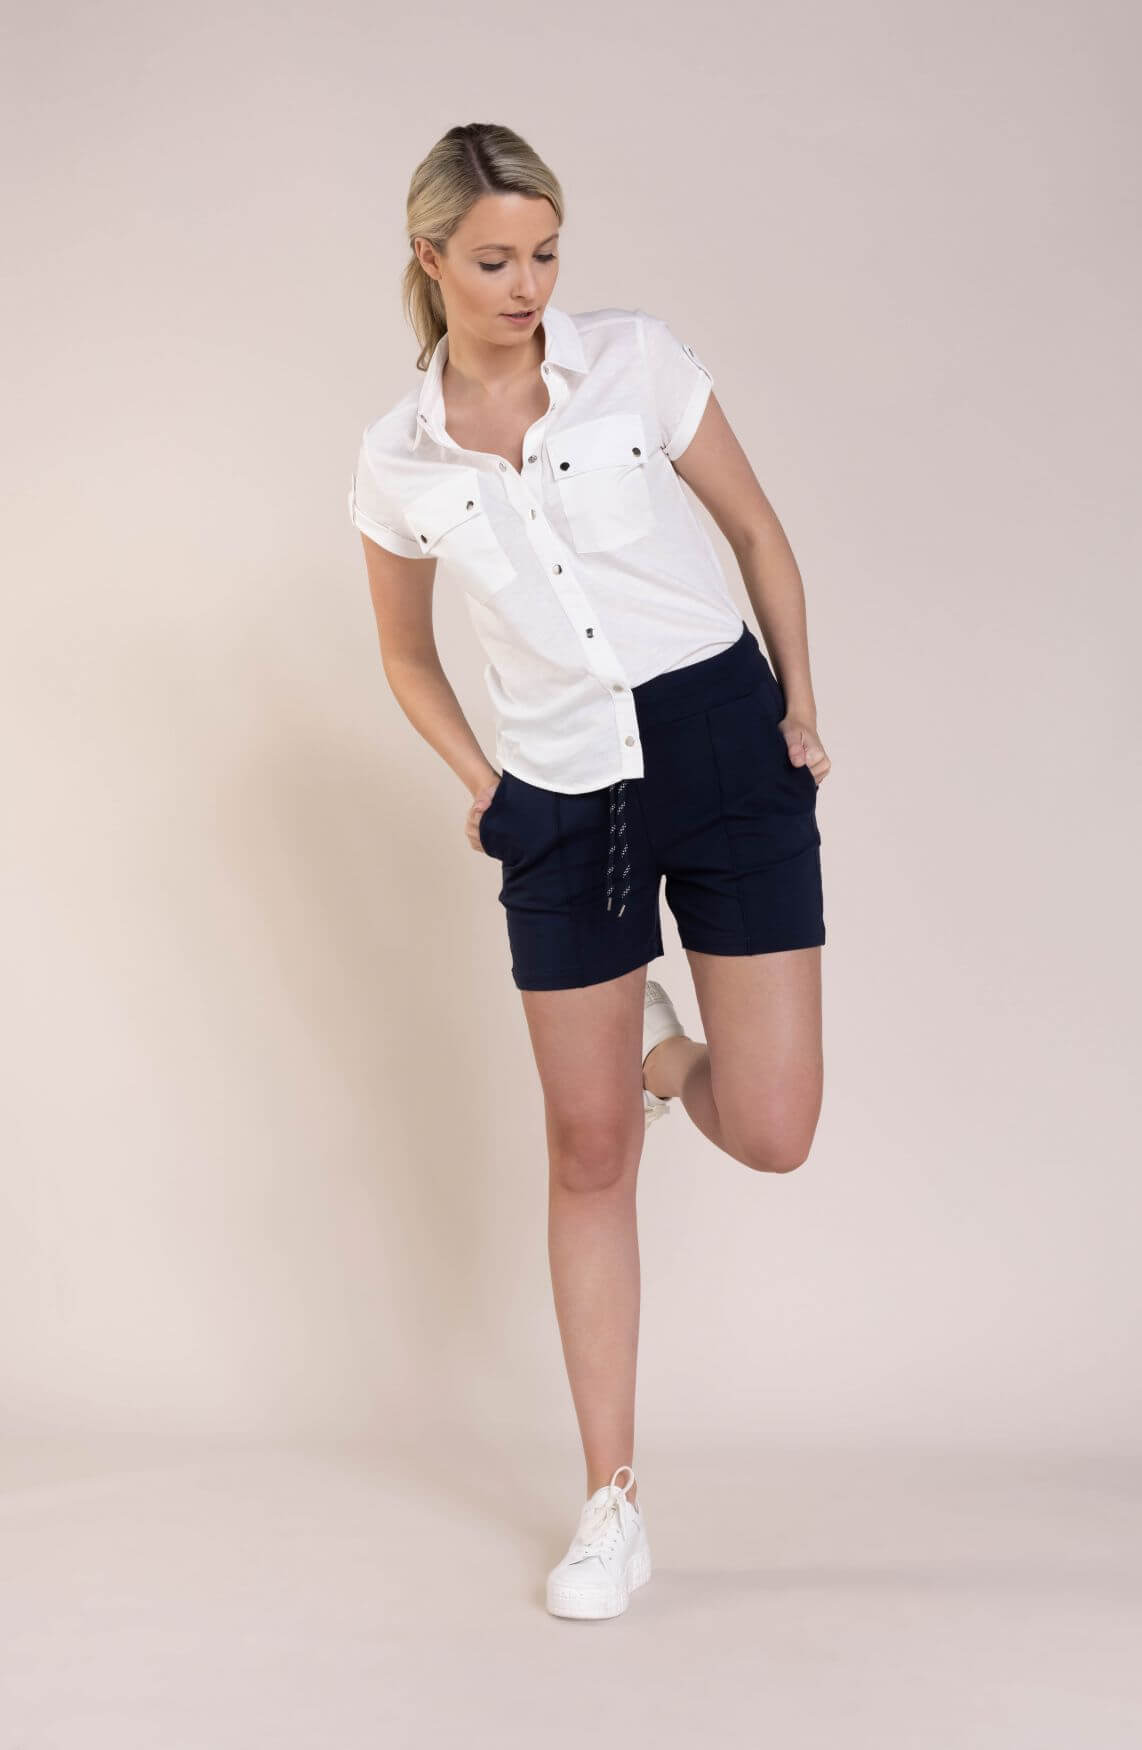 Anna Blue Dames Katoenen blouse Wit